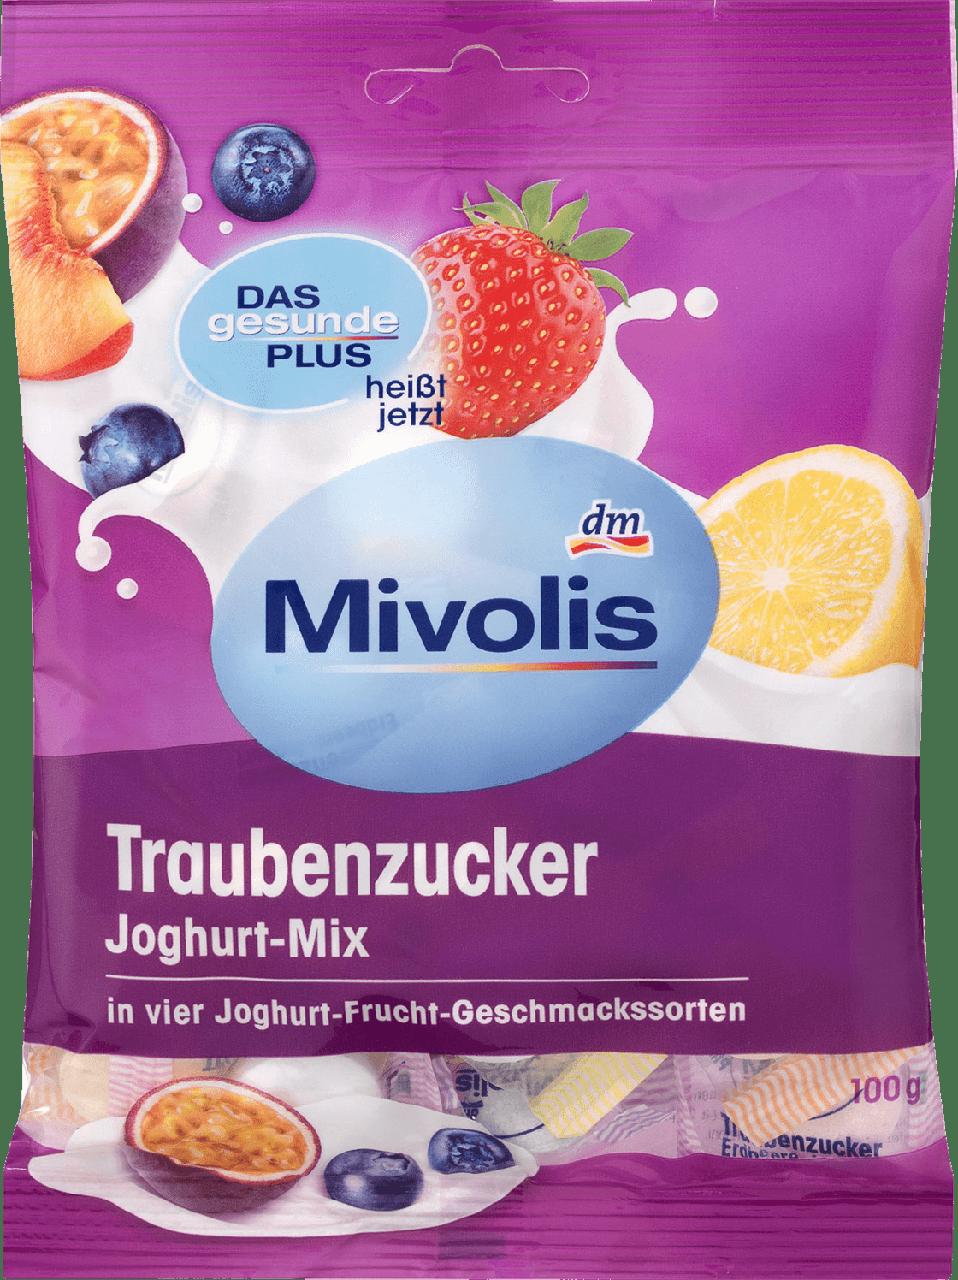 Декстрозные сладости без сахара Mivolis Traubenzucker Joghurt-Mix, 100 гр.(37шт)